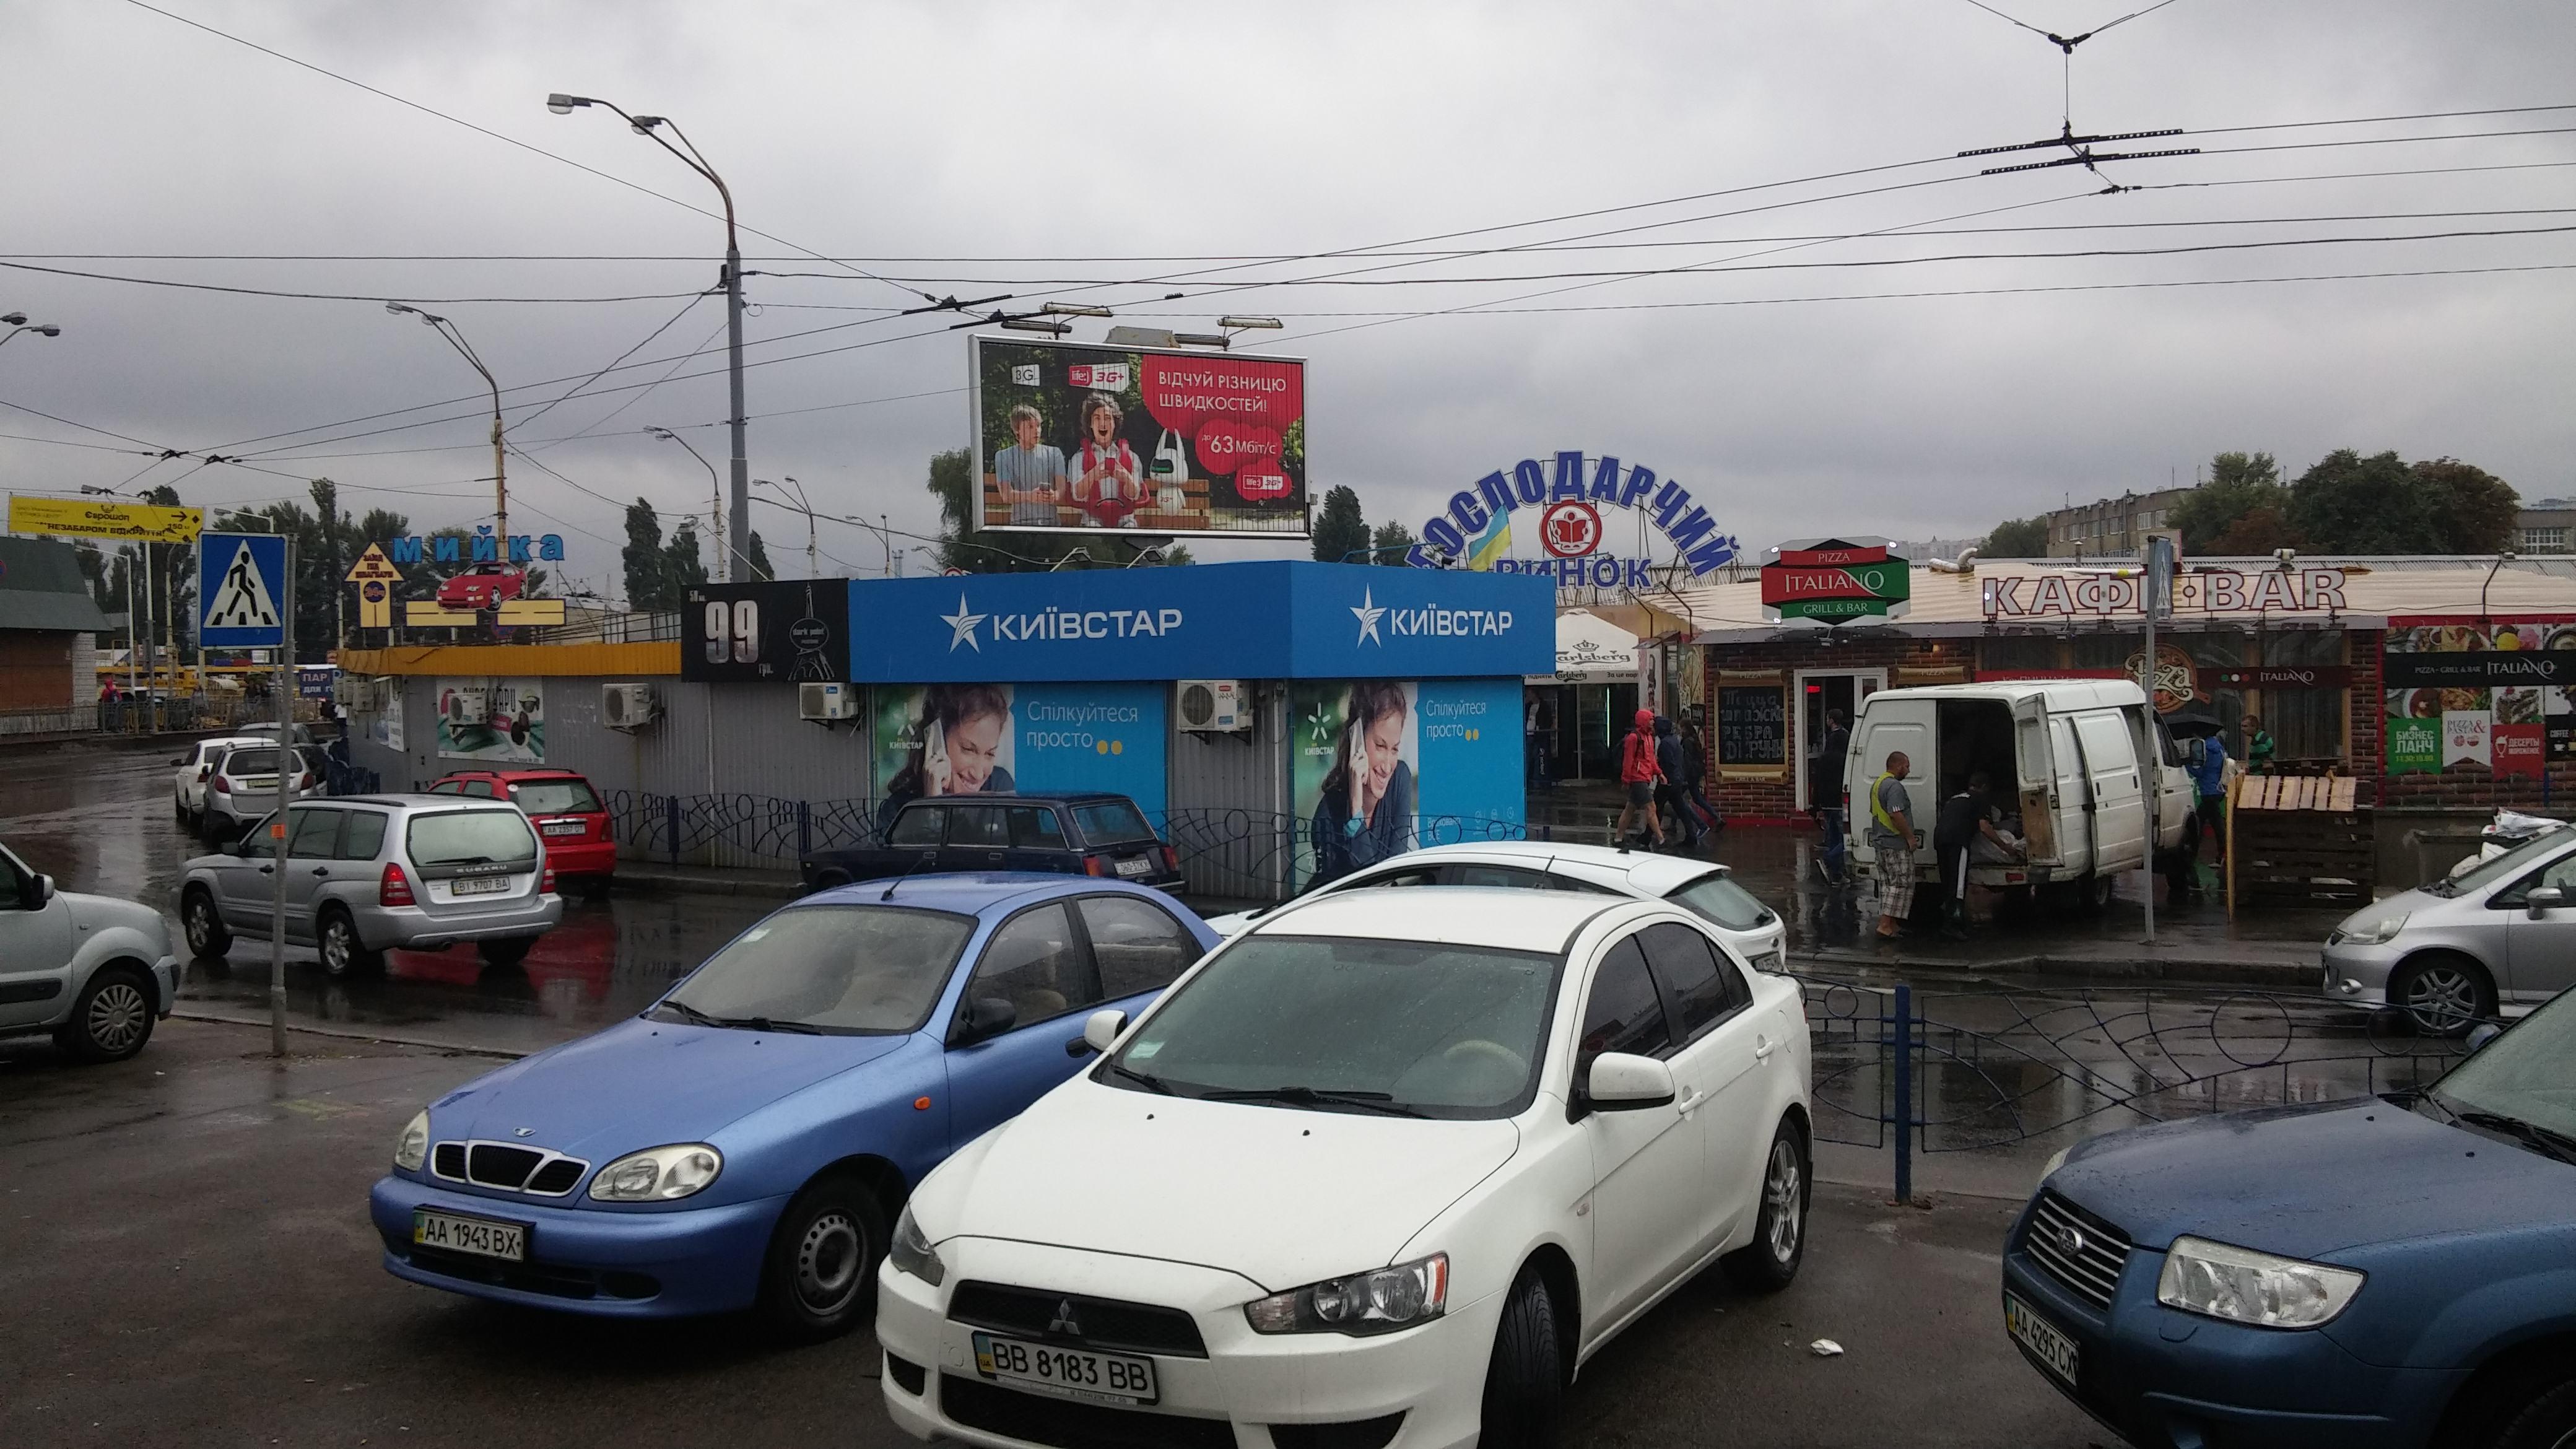 Kijów reklama